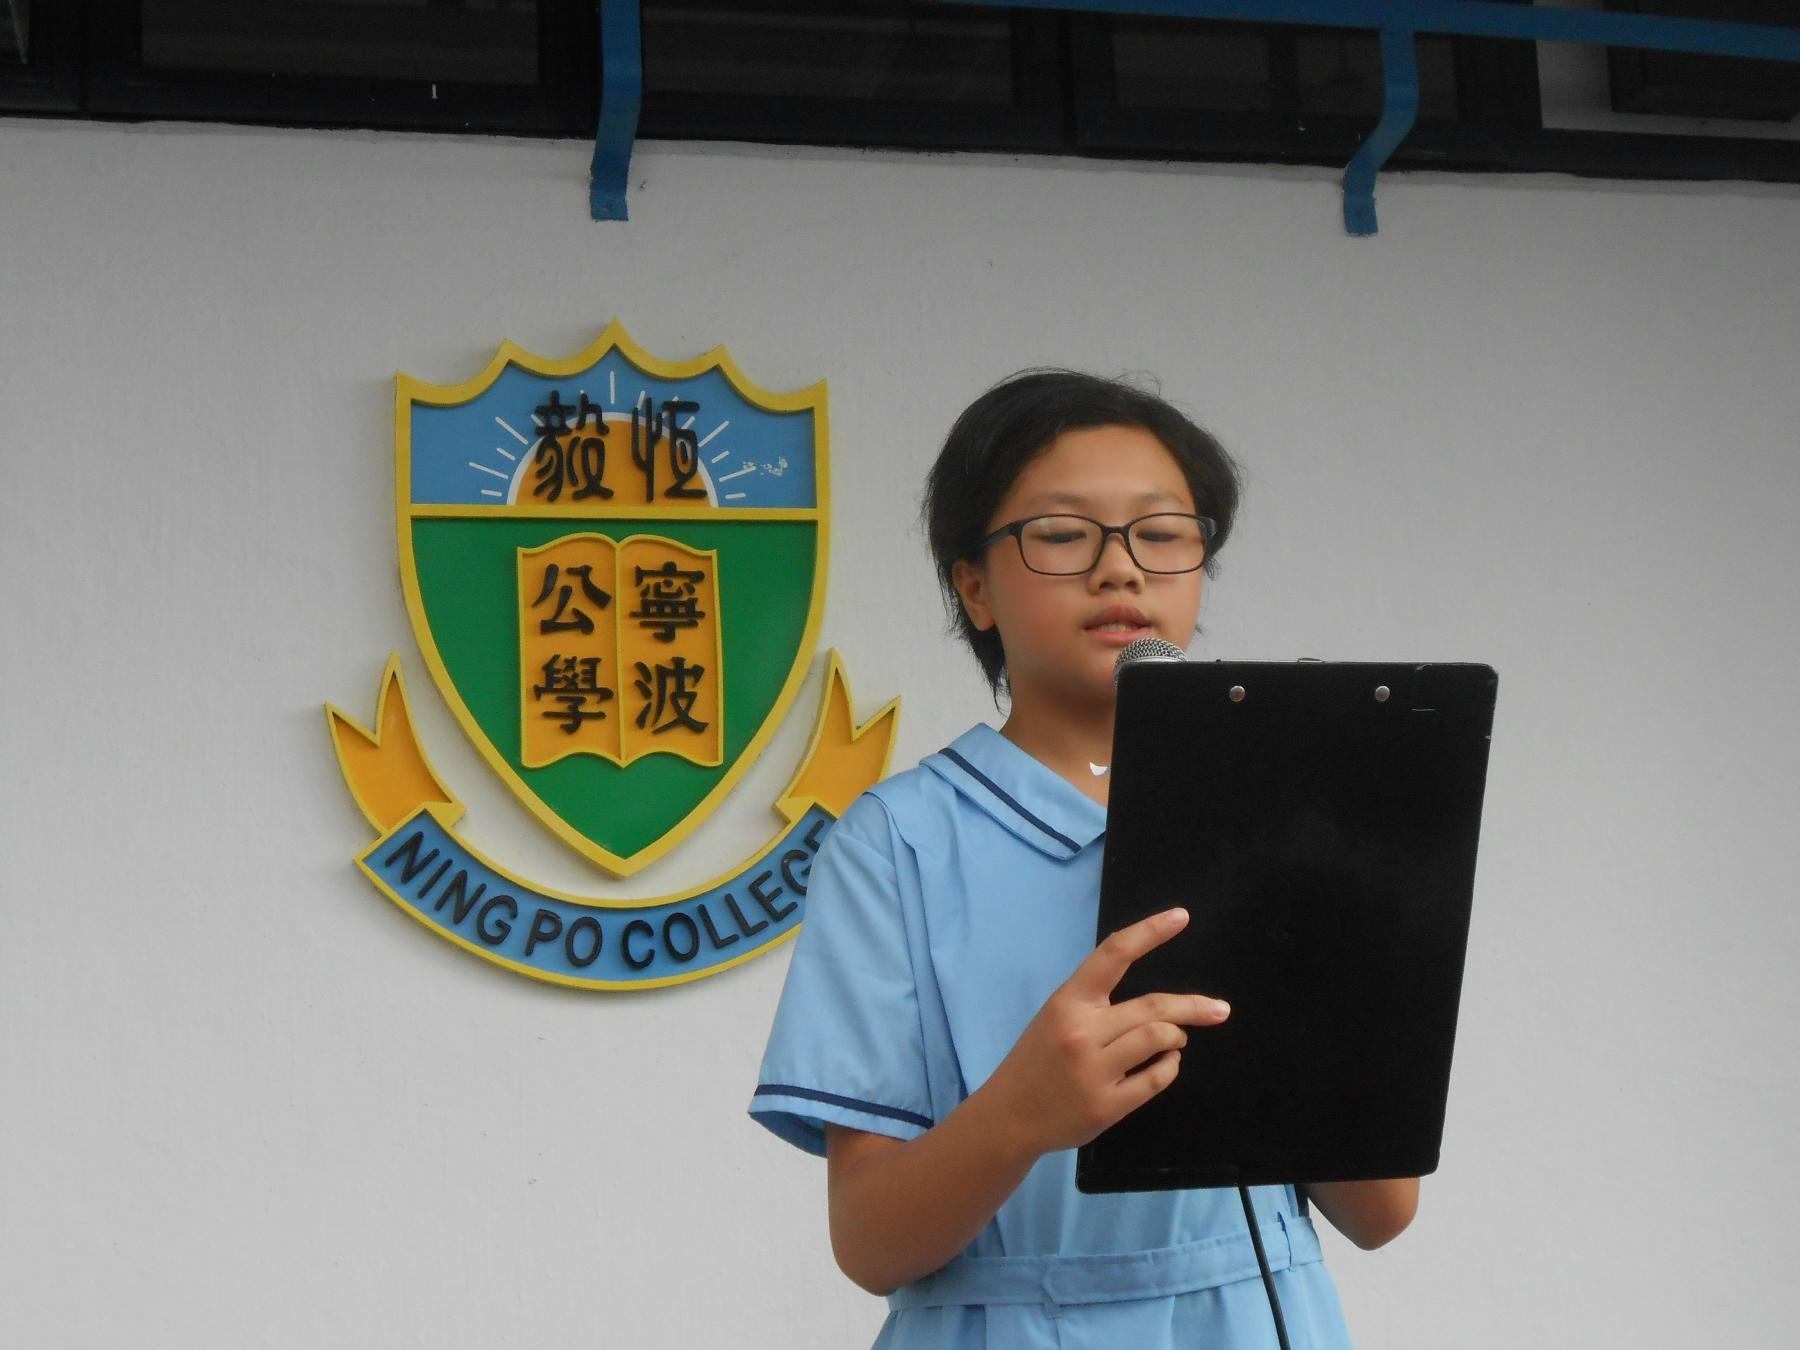 http://www.npc.edu.hk/sites/default/files/dscn0773.jpg